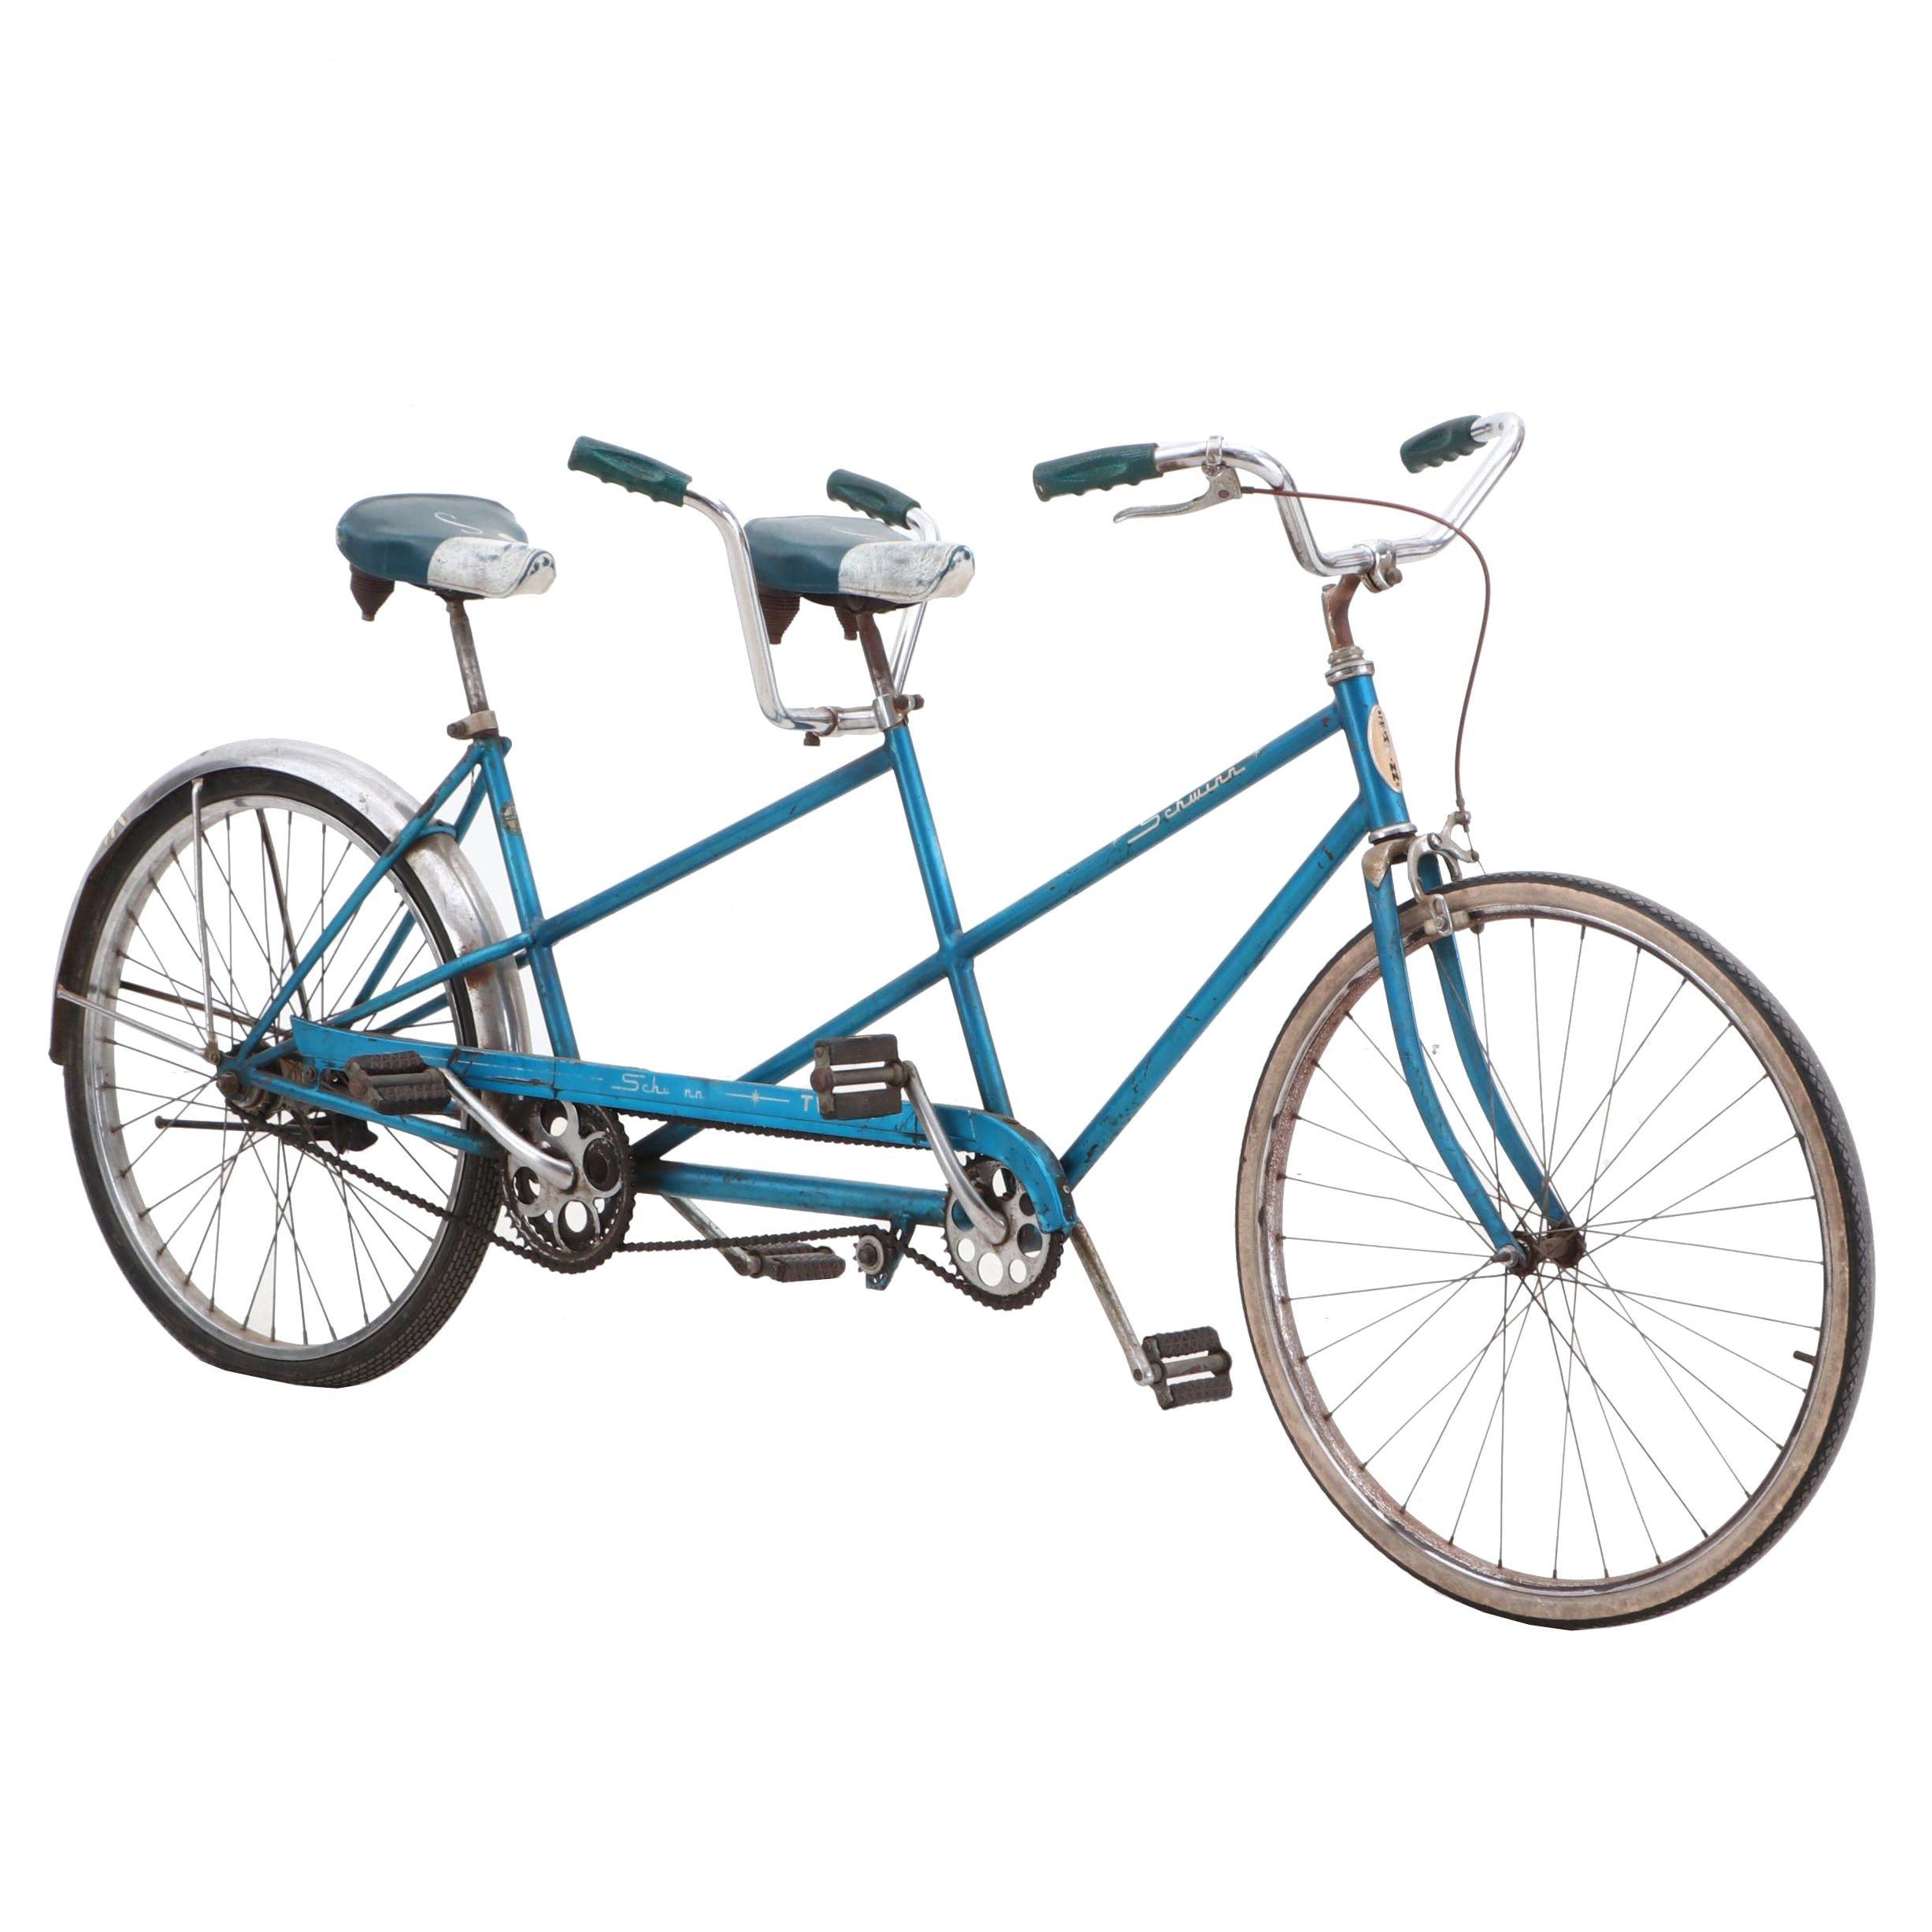 Vintage Schwinn Two-Seat Bicycle